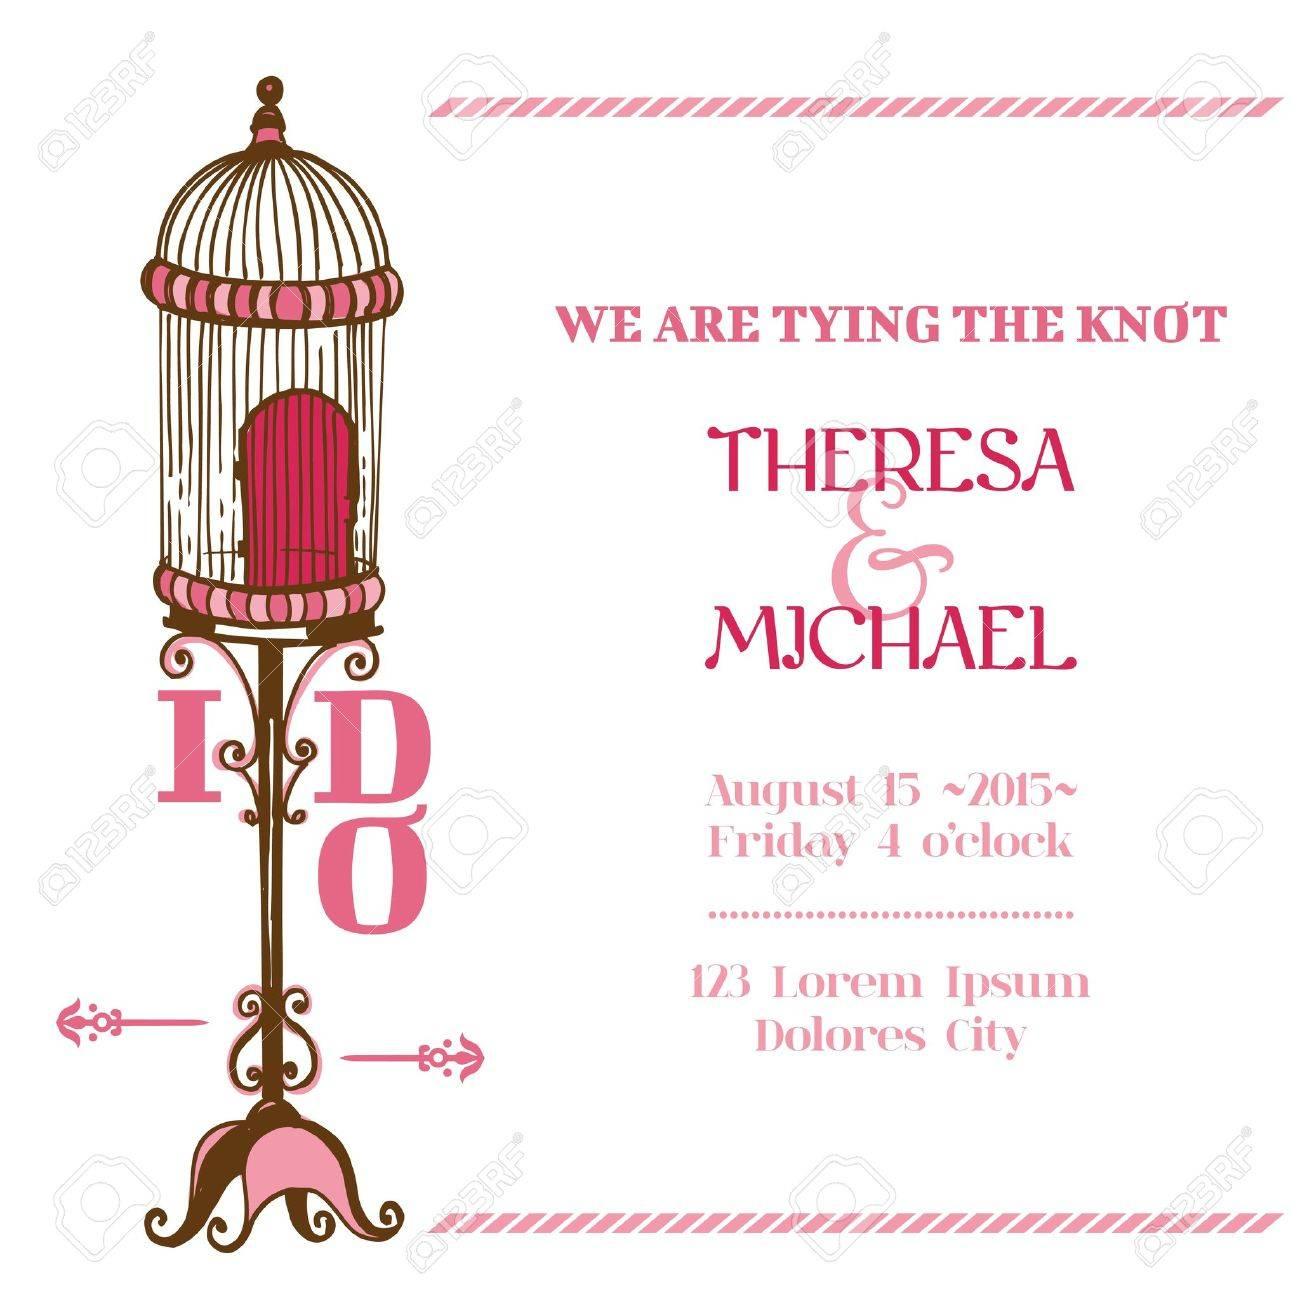 Wedding Vintage Invitation Card Bird Cage Theme For Design – Designing an Invitation Card